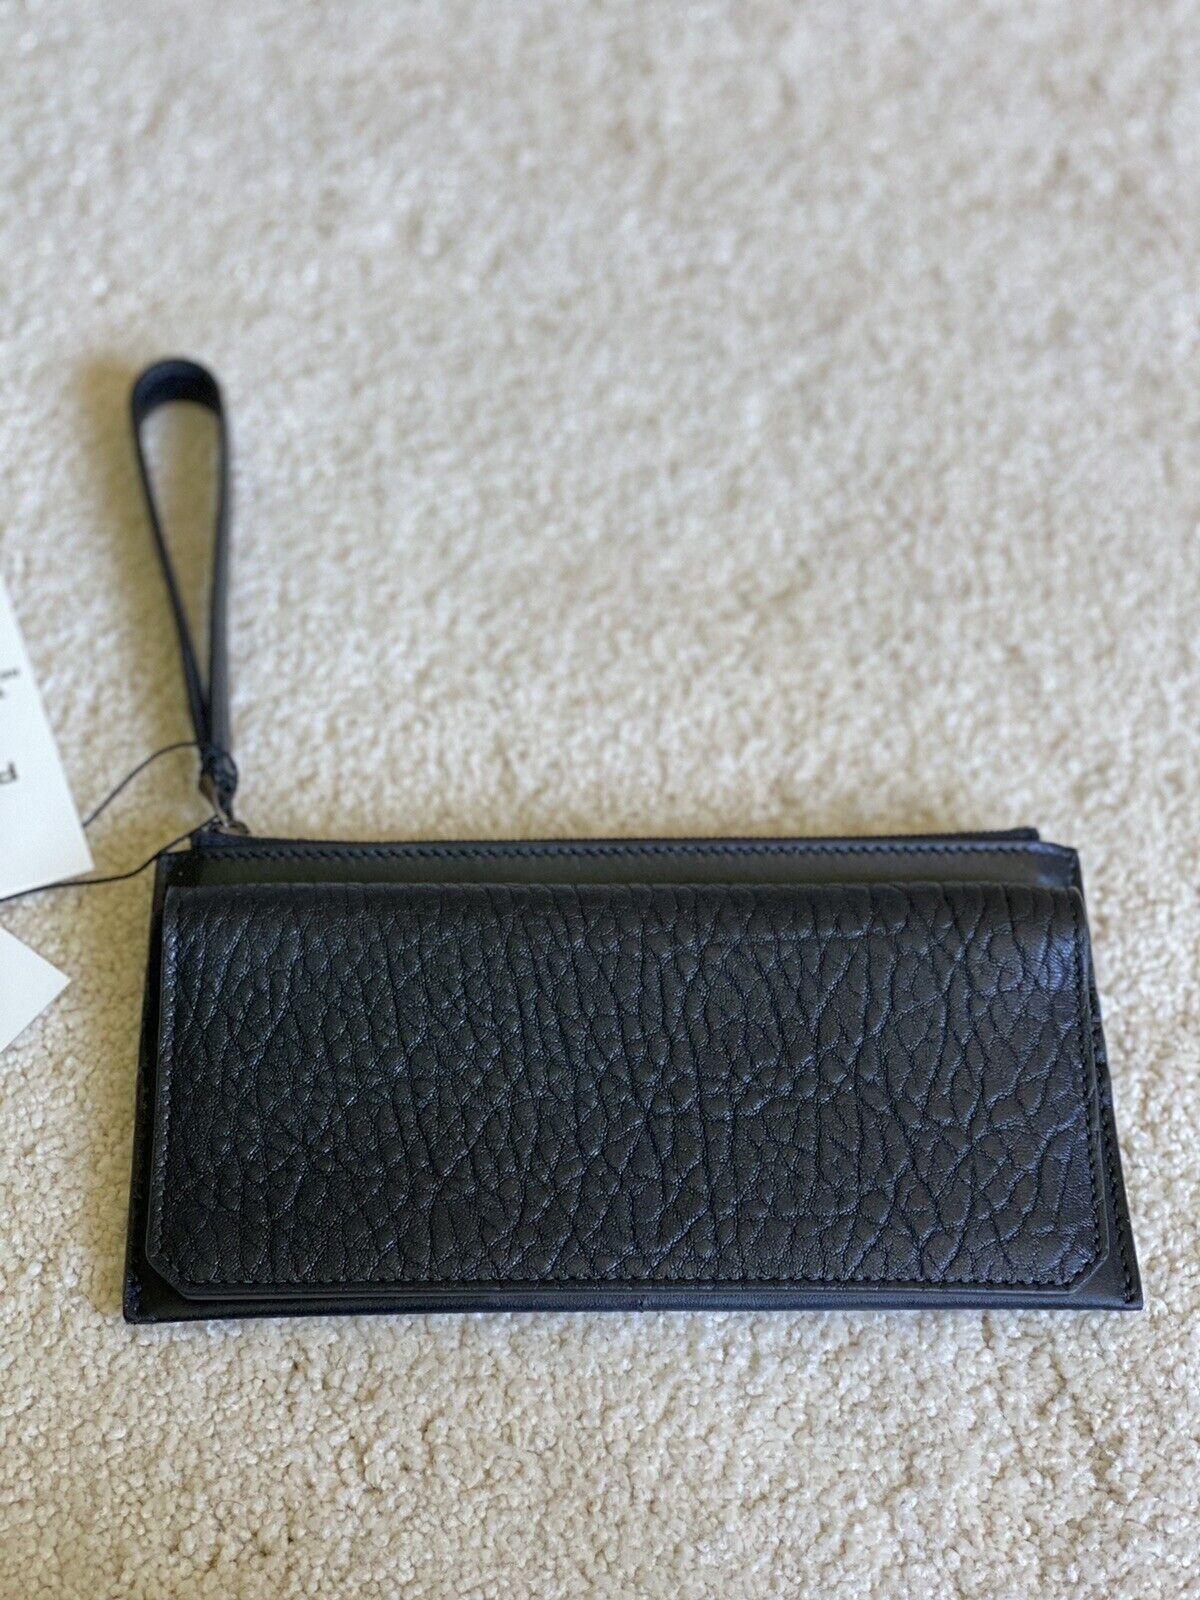 M. Gemi x 30 Studio Maggio Essa Zip Case black leather wallet